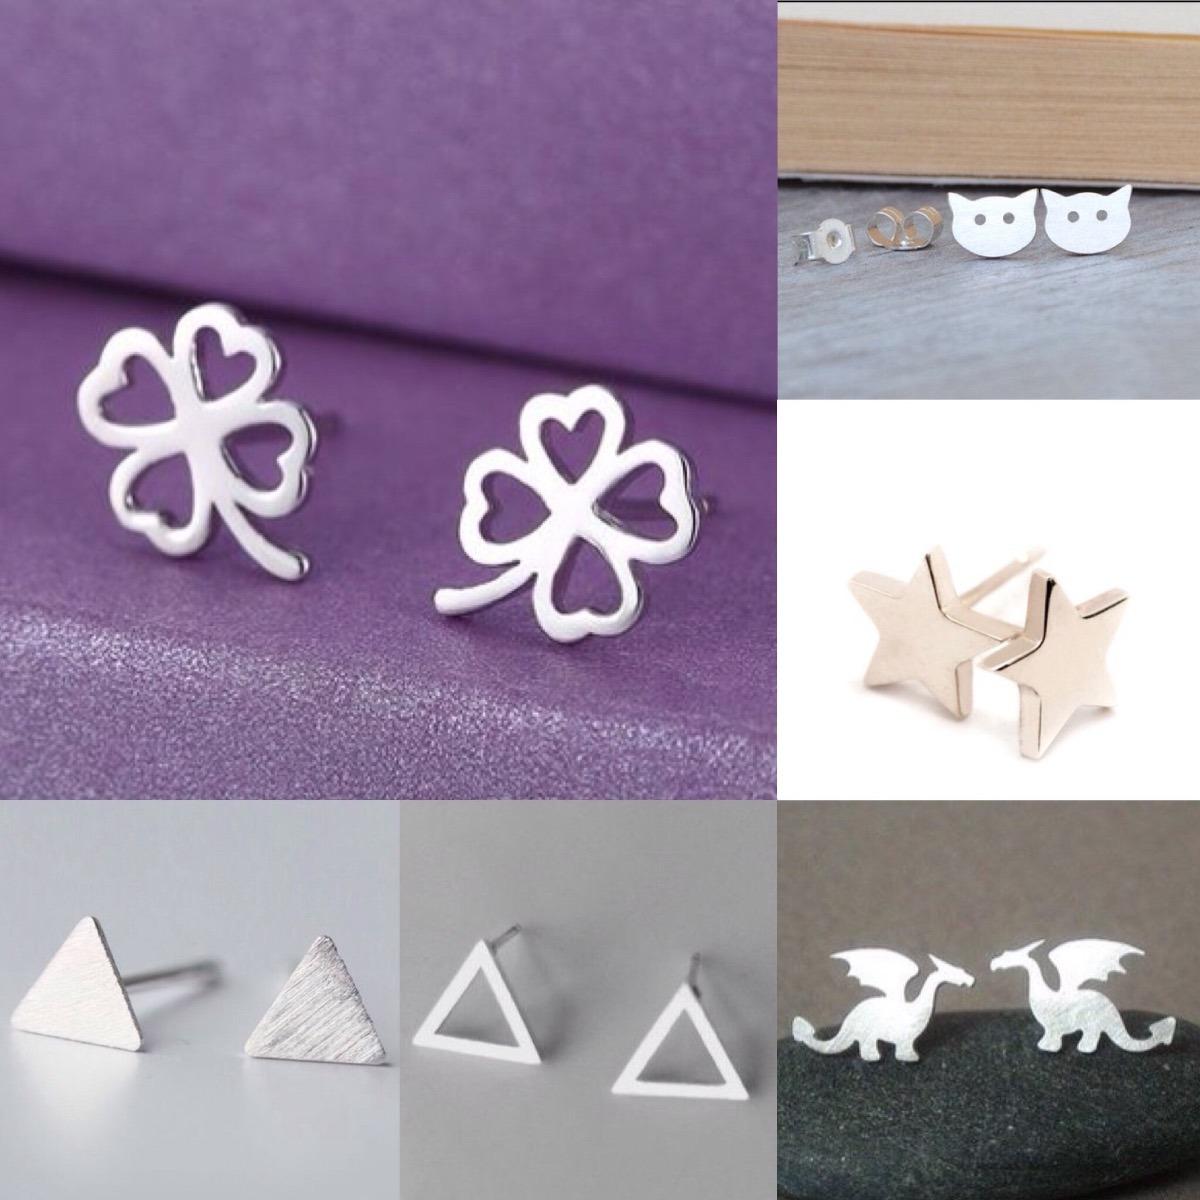 9493f96d7021 artesano peruano fabrica joyas de plata recuerdo graduacion. Cargando zoom.